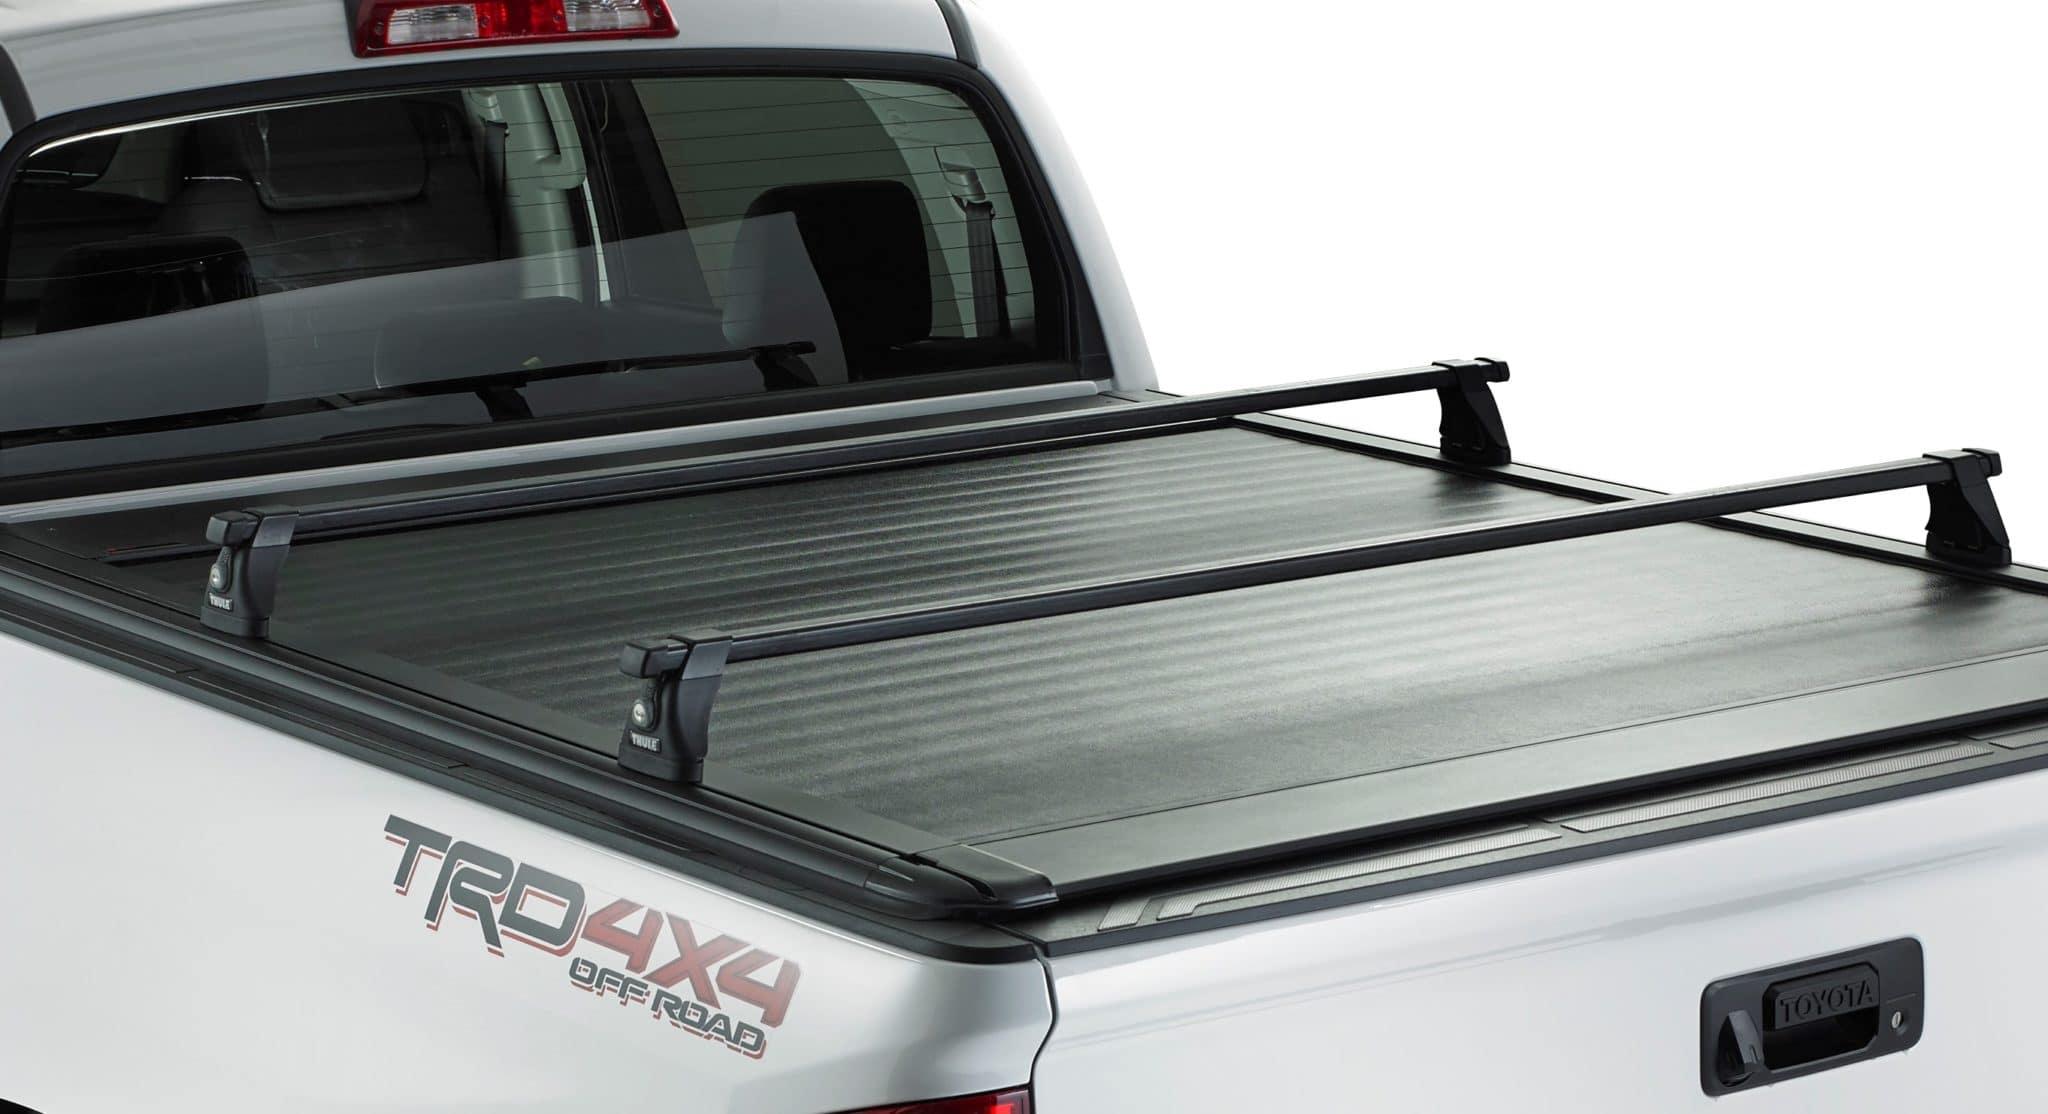 Ultragroove Tonneau on Toyota (rack not included)